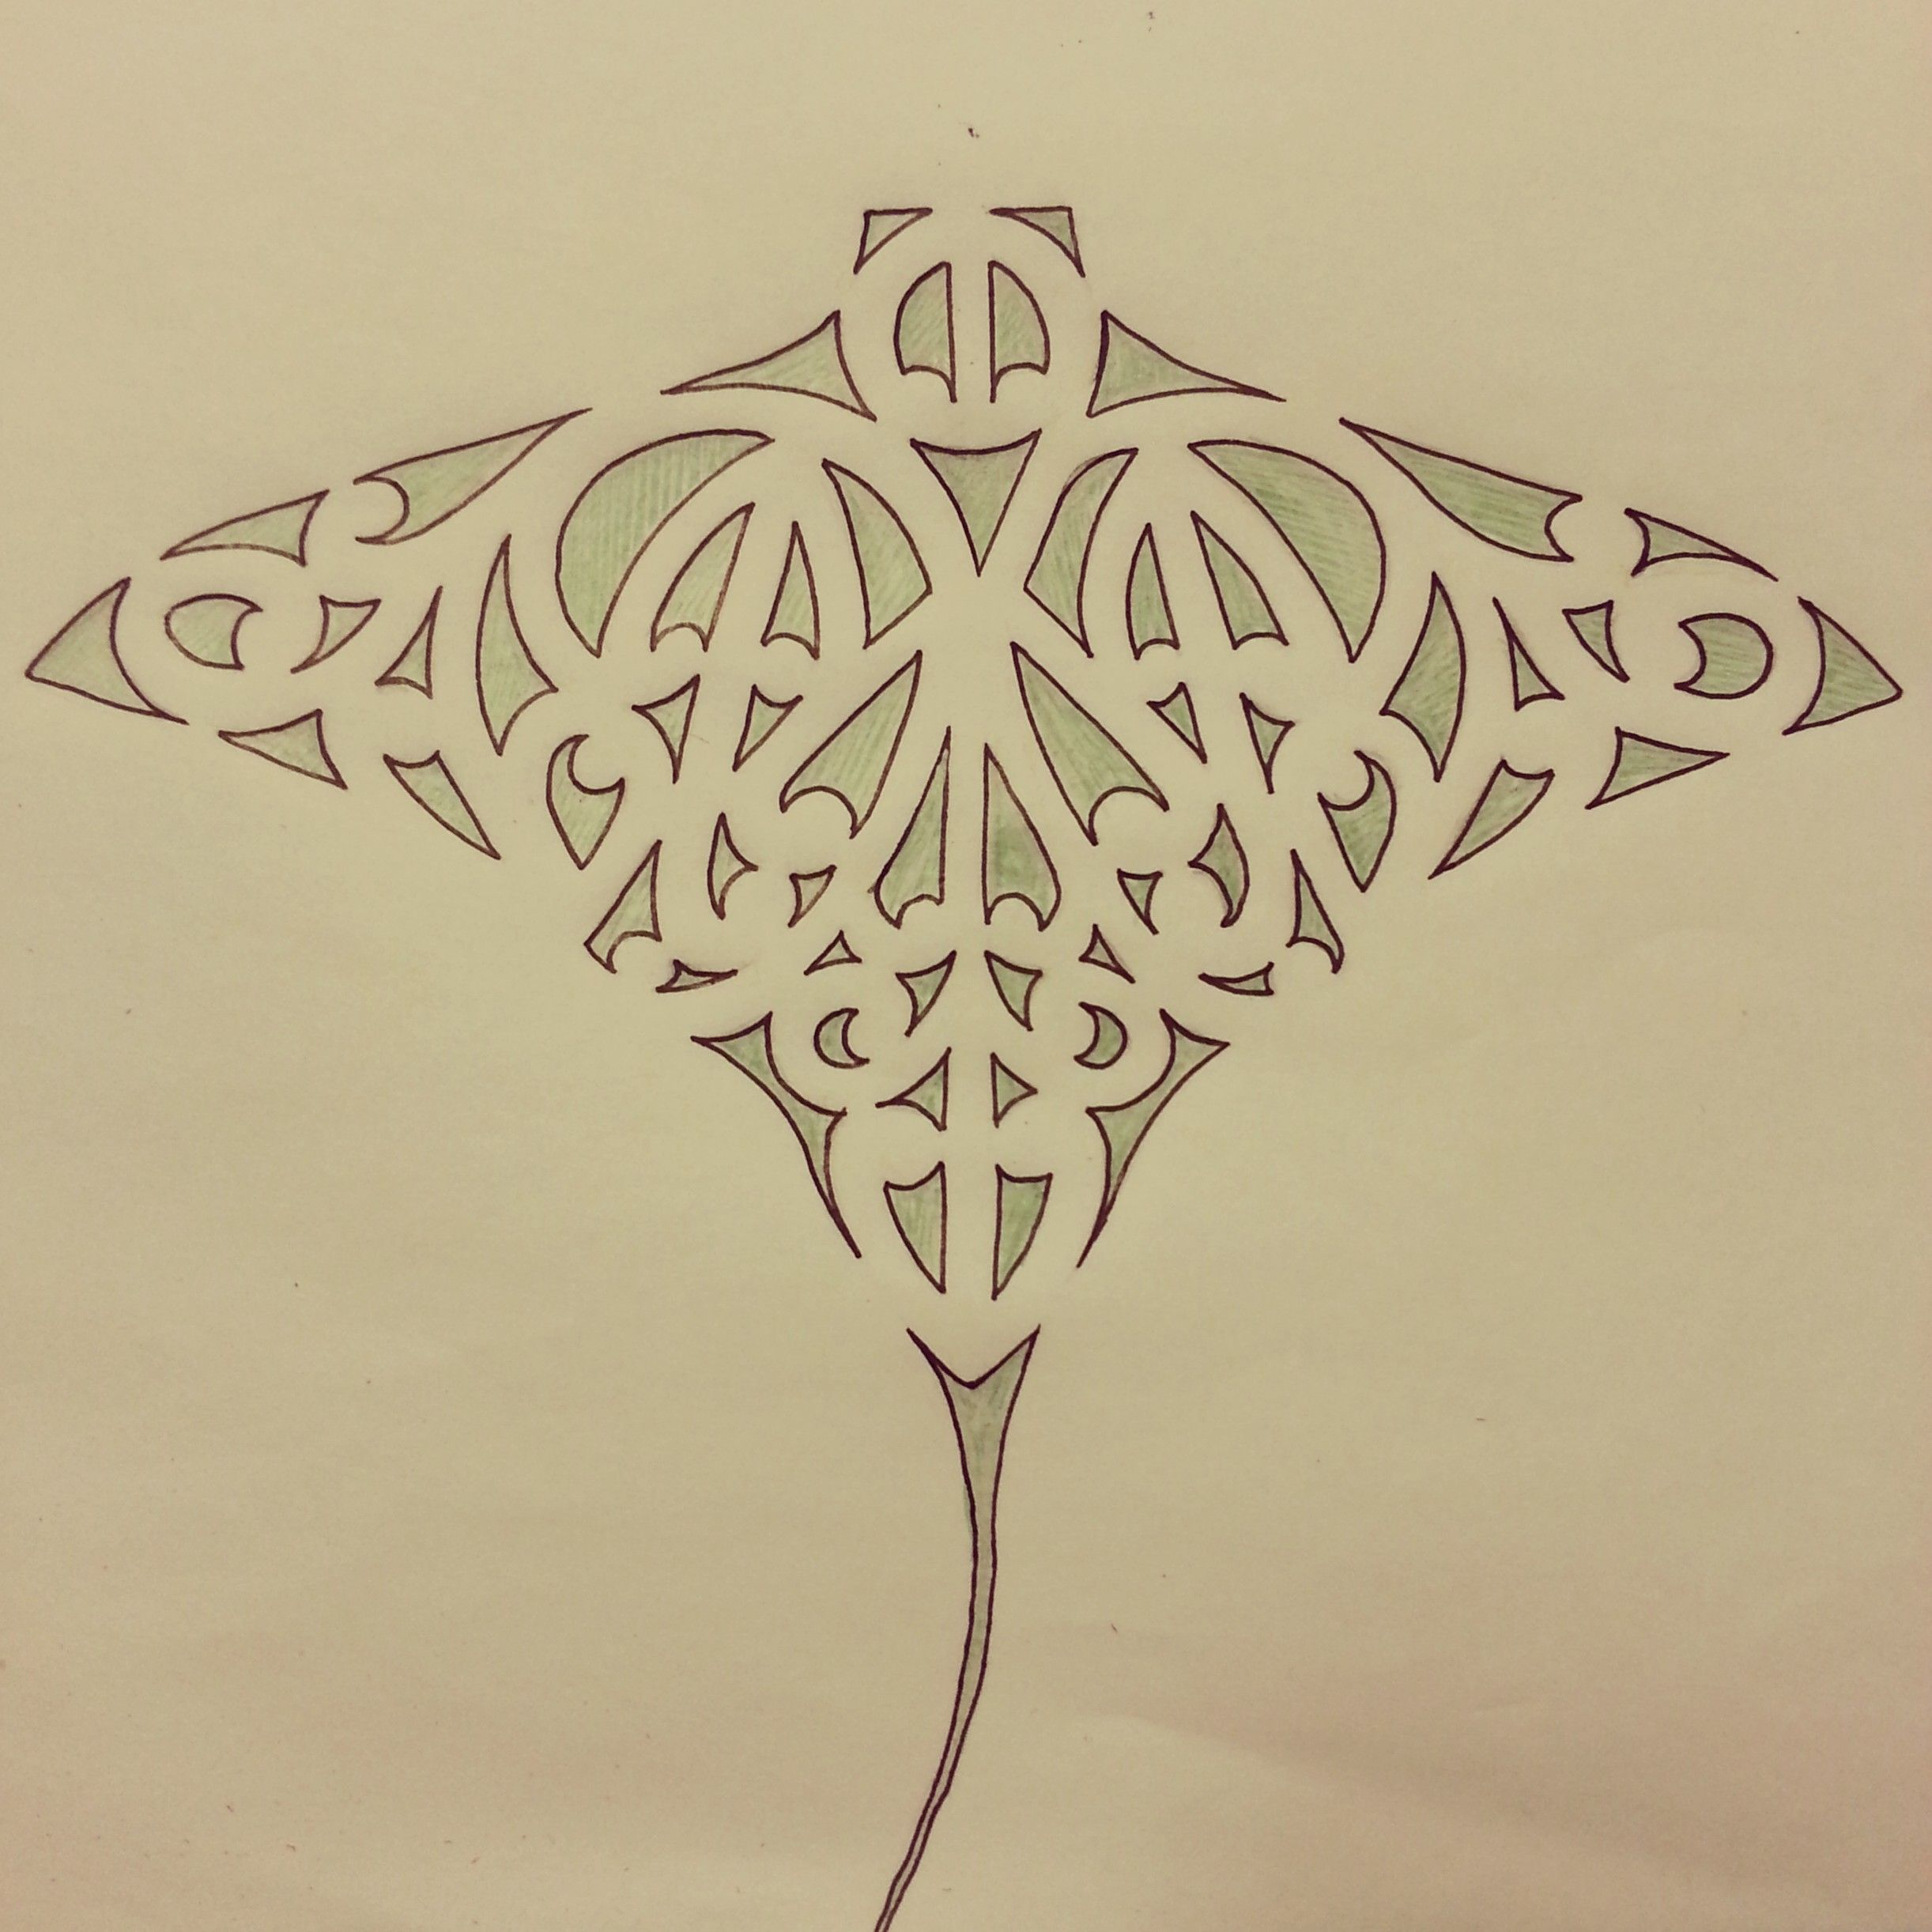 Maori Art Tattoo Designs: Maori Whai / Ray / Stingray Tattoo Design Featuring